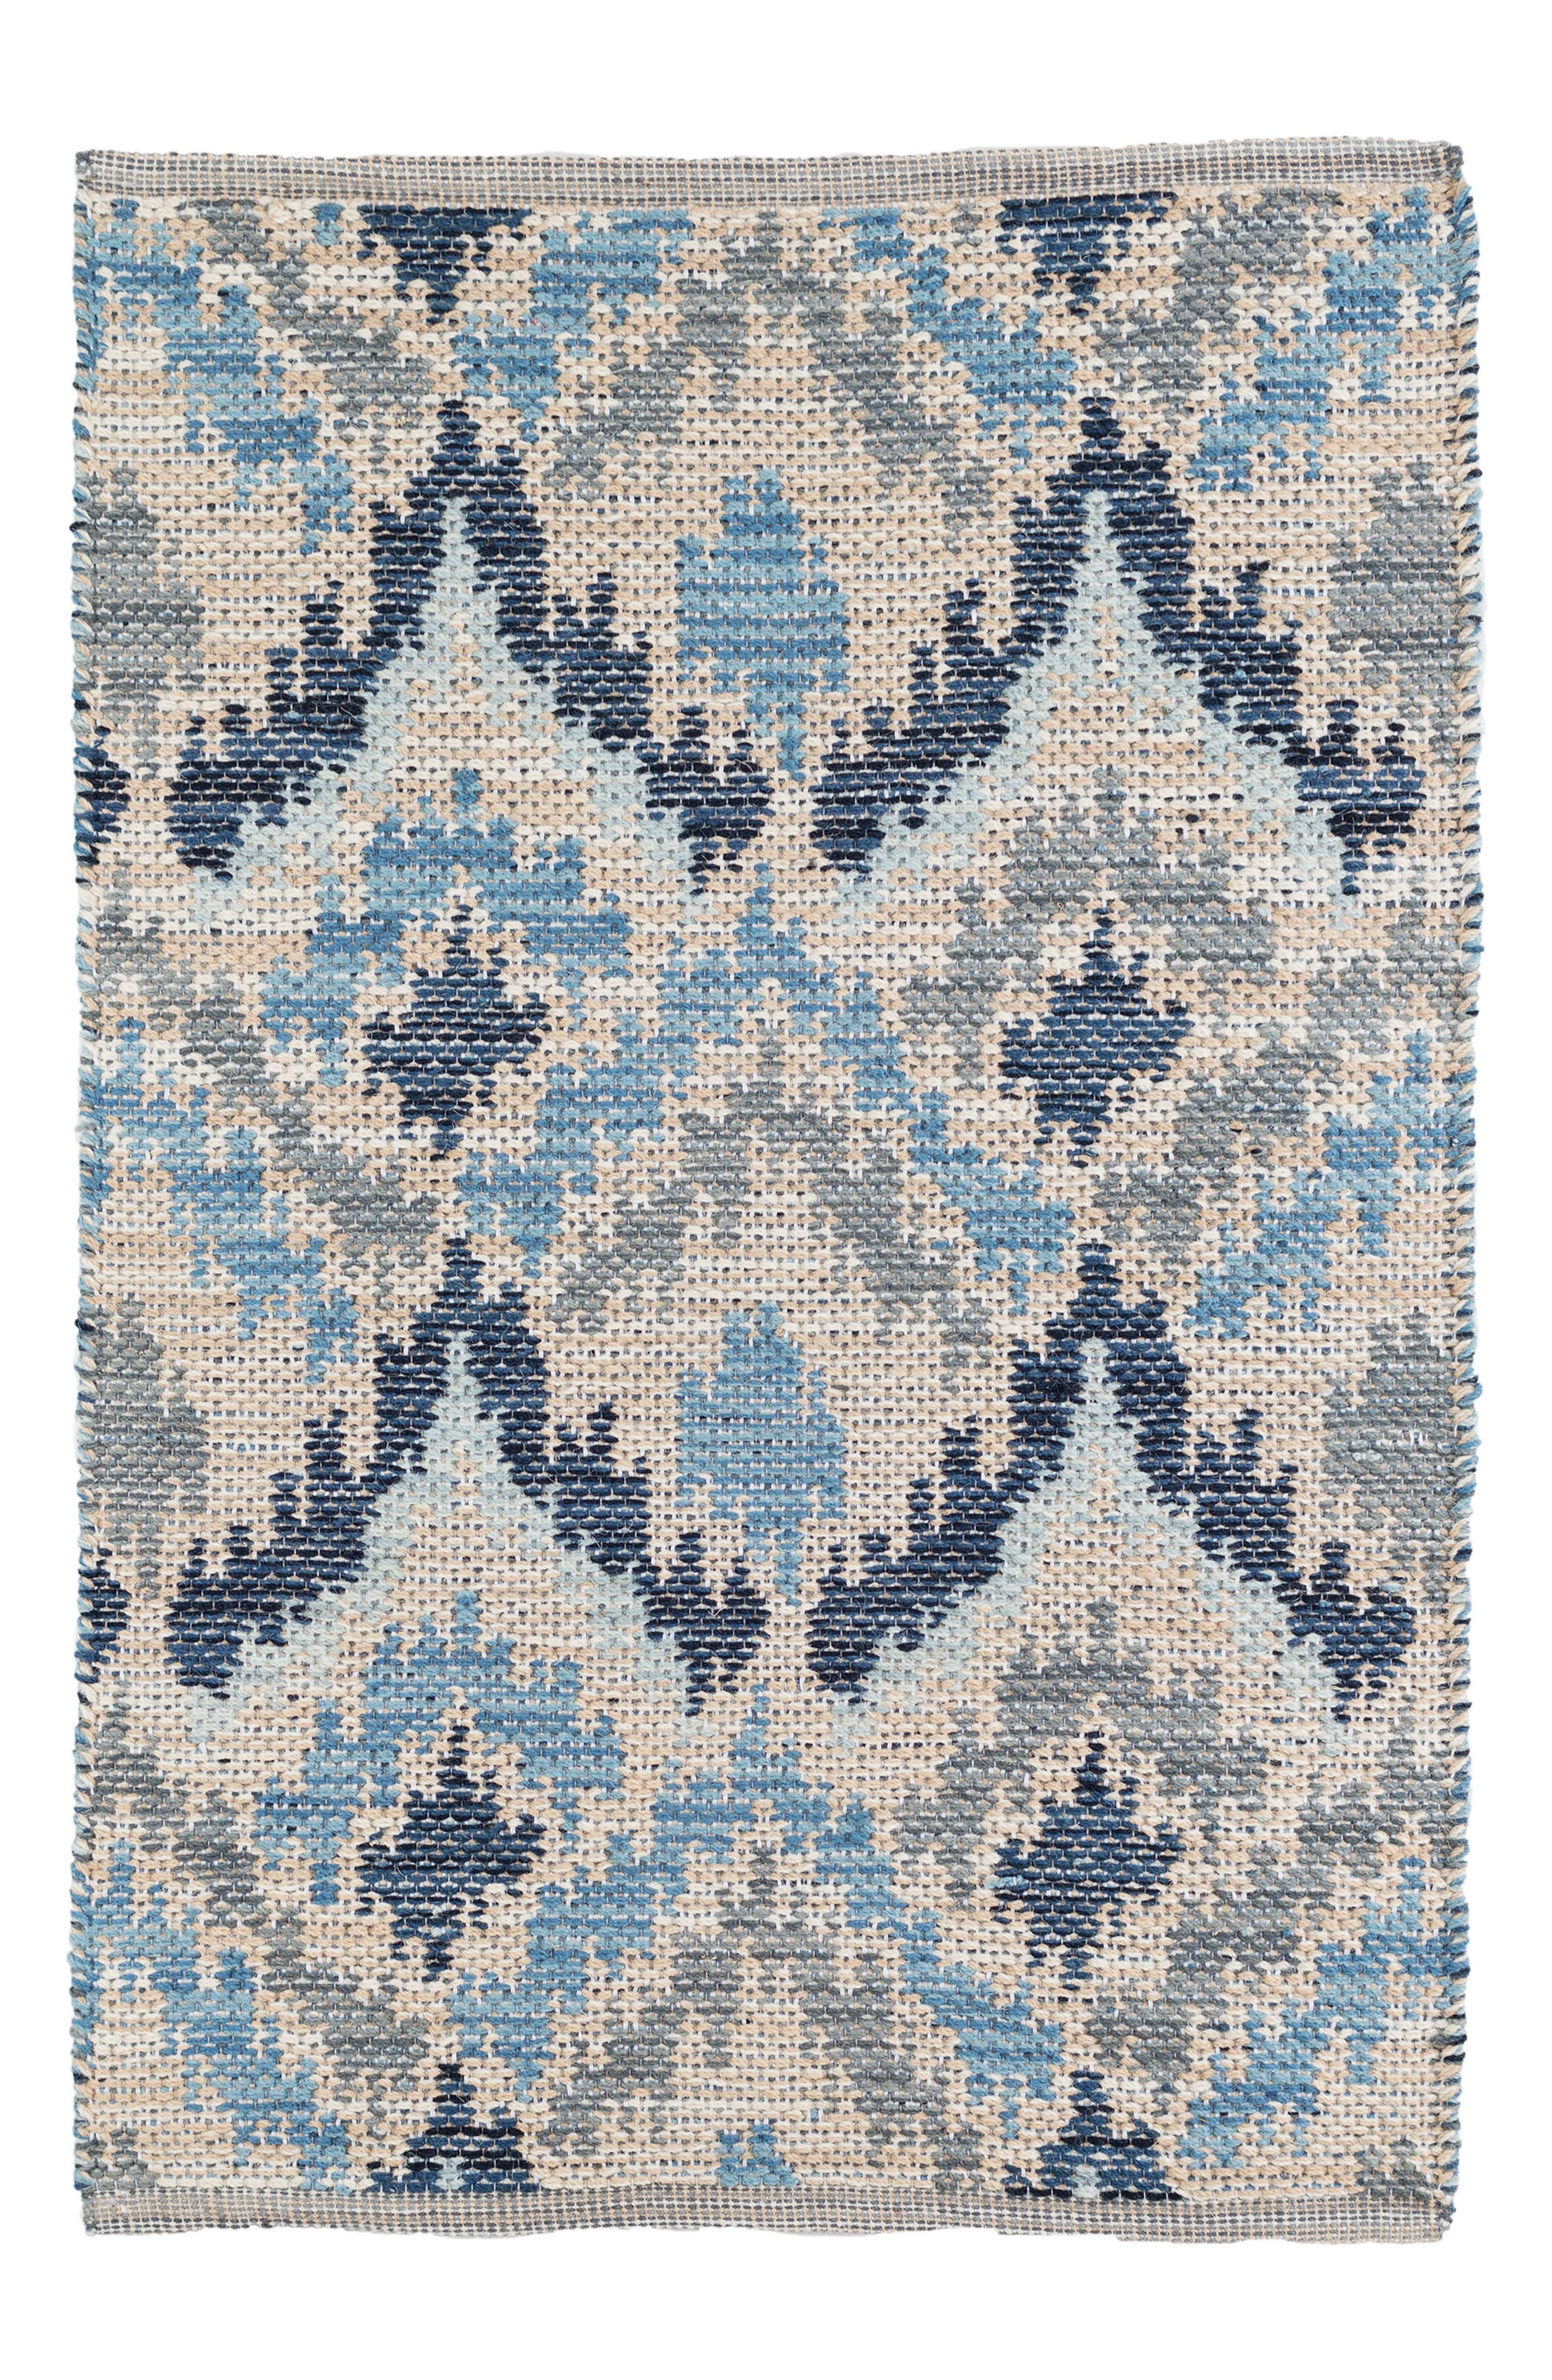 Medina Woven Rug,                             Main thumbnail 1, color,                             Blue